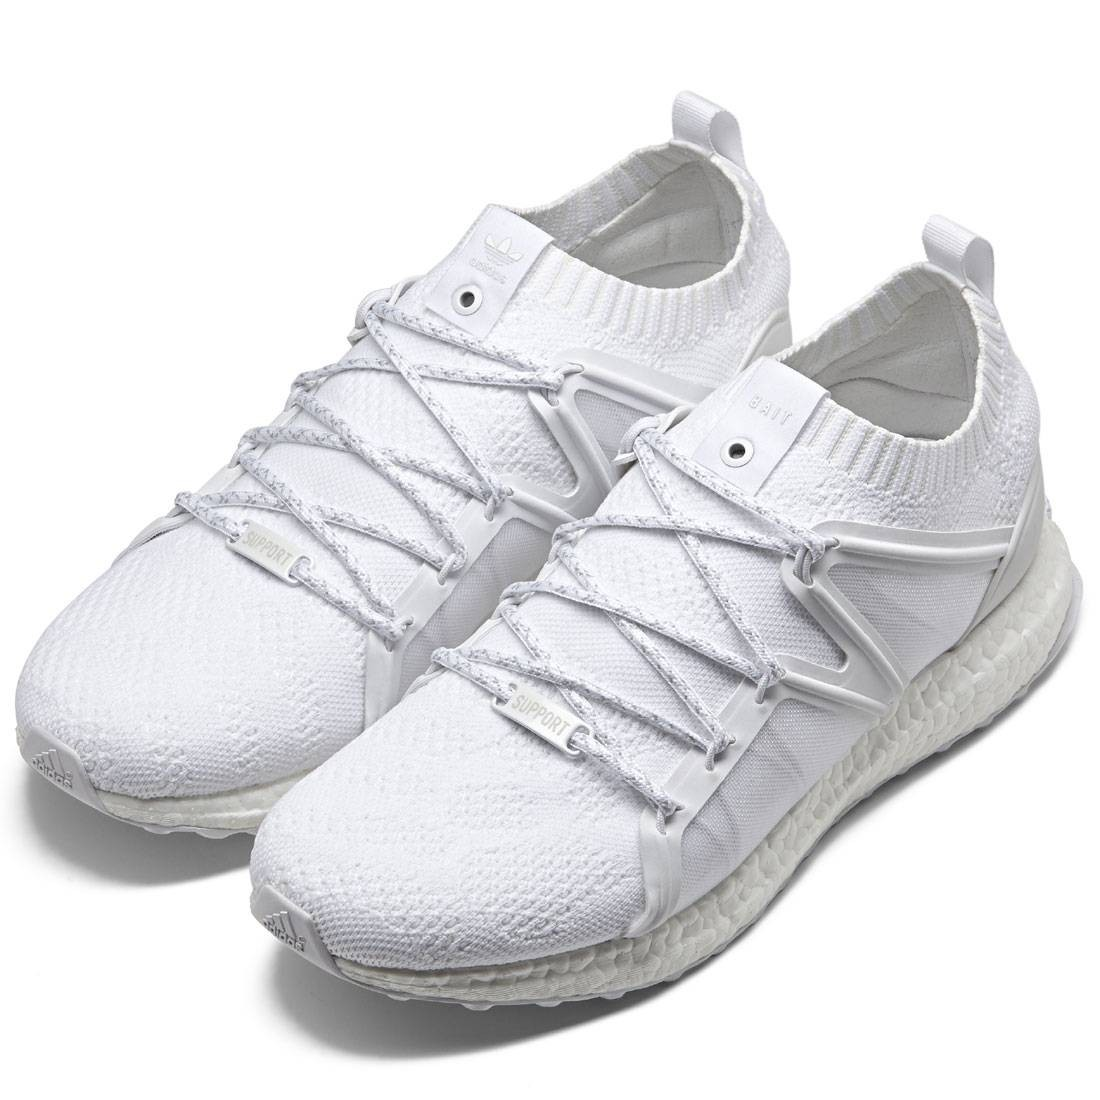 watch d2242 1aa9a BAIT x Adidas Consortium EQT Support 93/16 R&D US Men Size 5